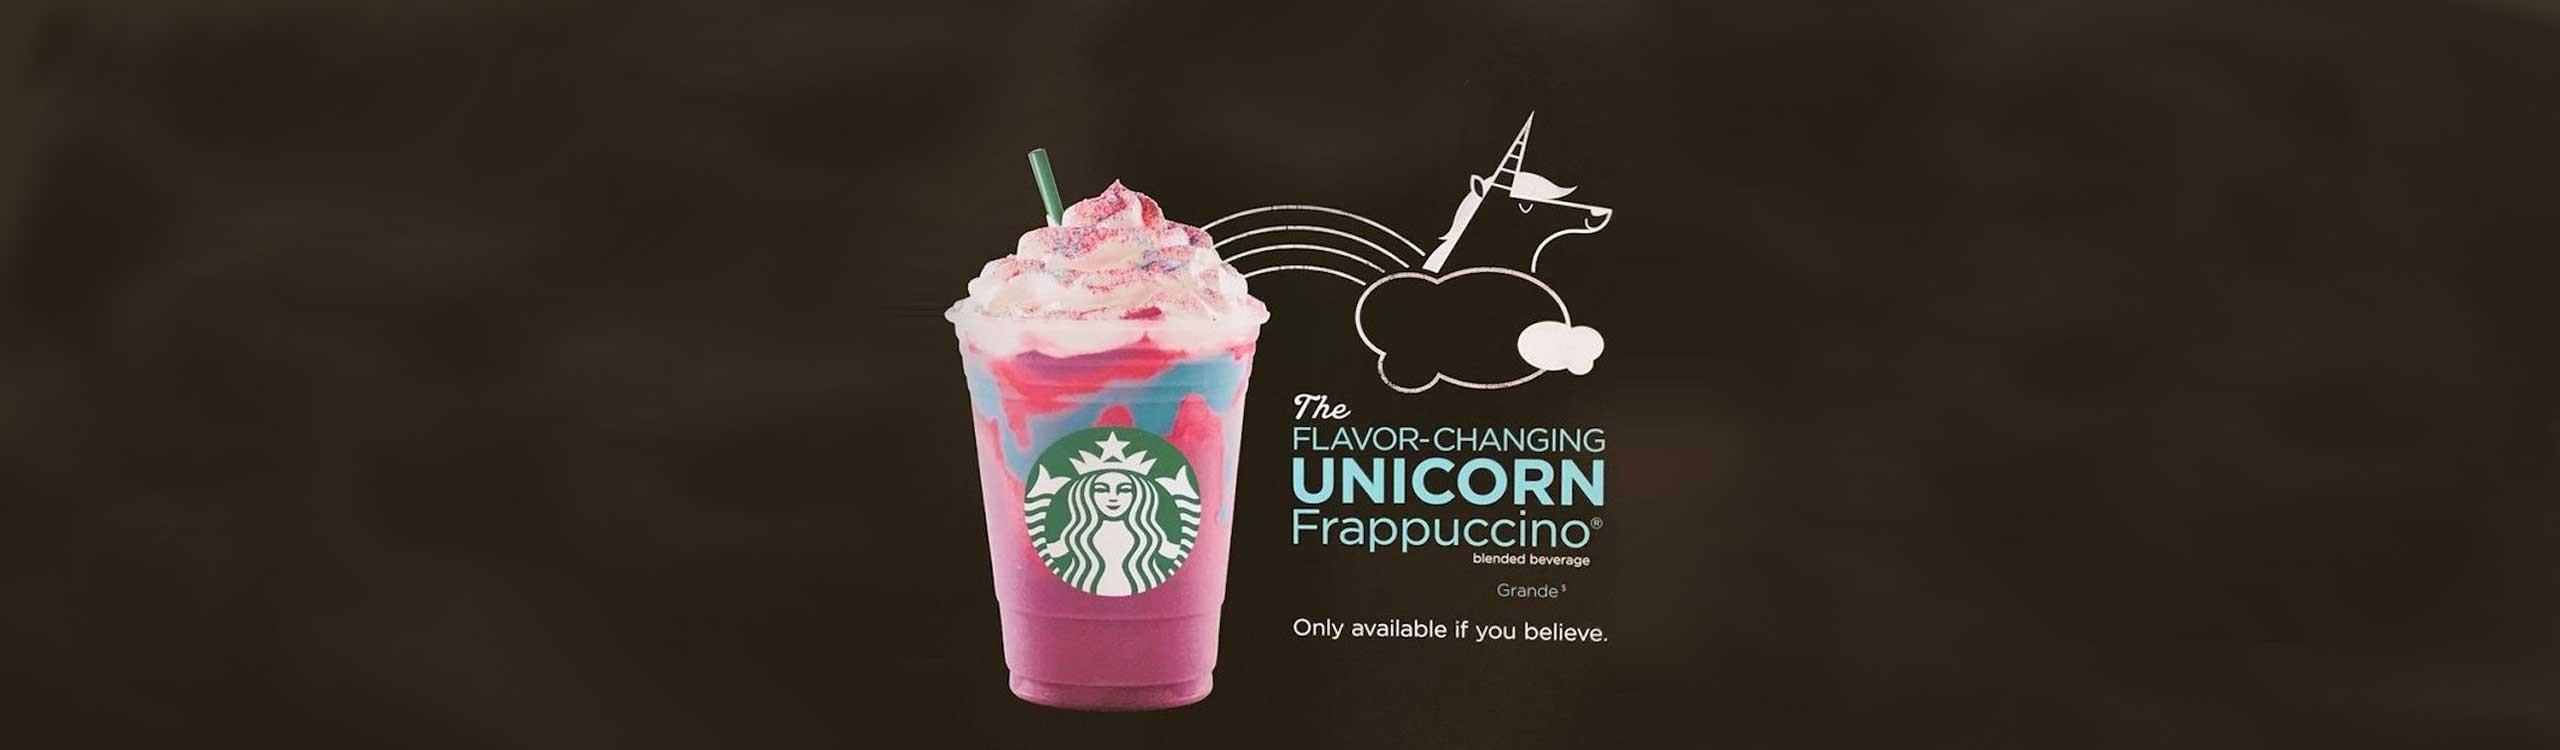 ¿te gustan los unicornios? starbucks ha lanzado un frappuccino solo para ti